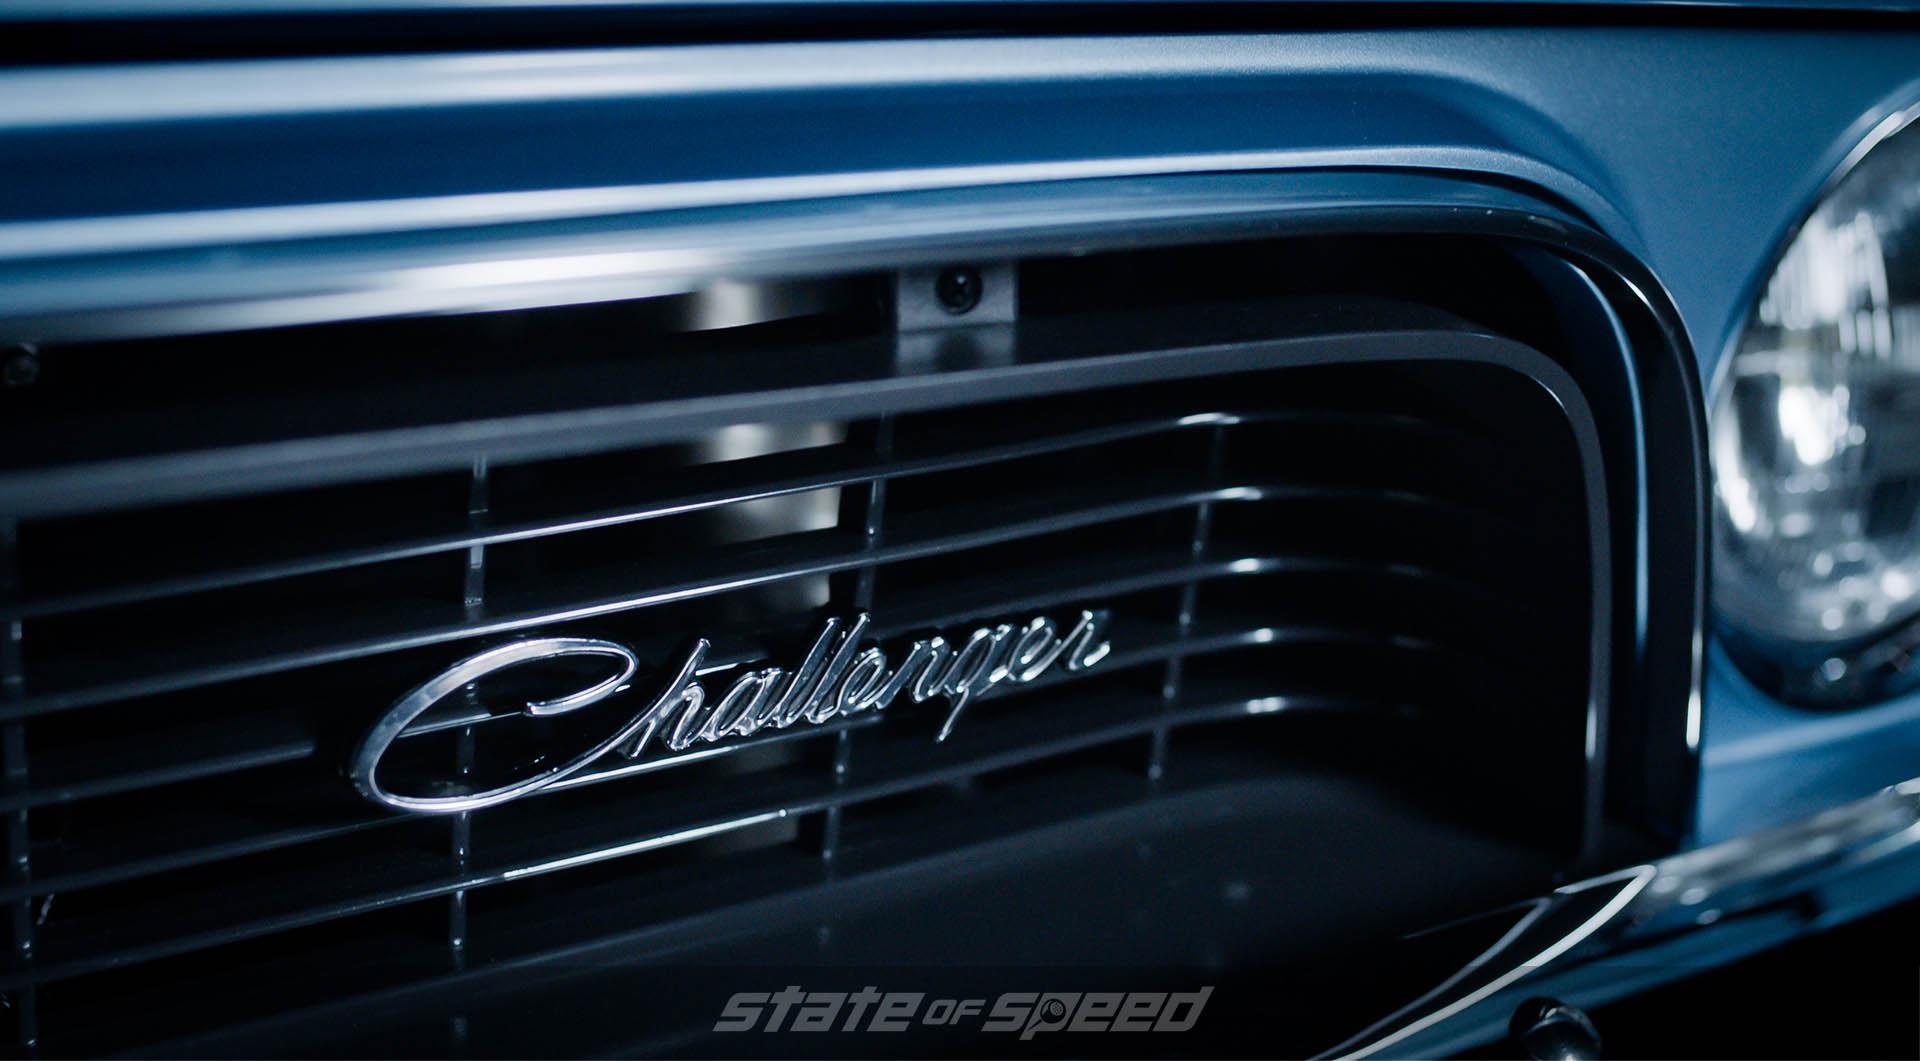 '73 Charles Schwab Challenger